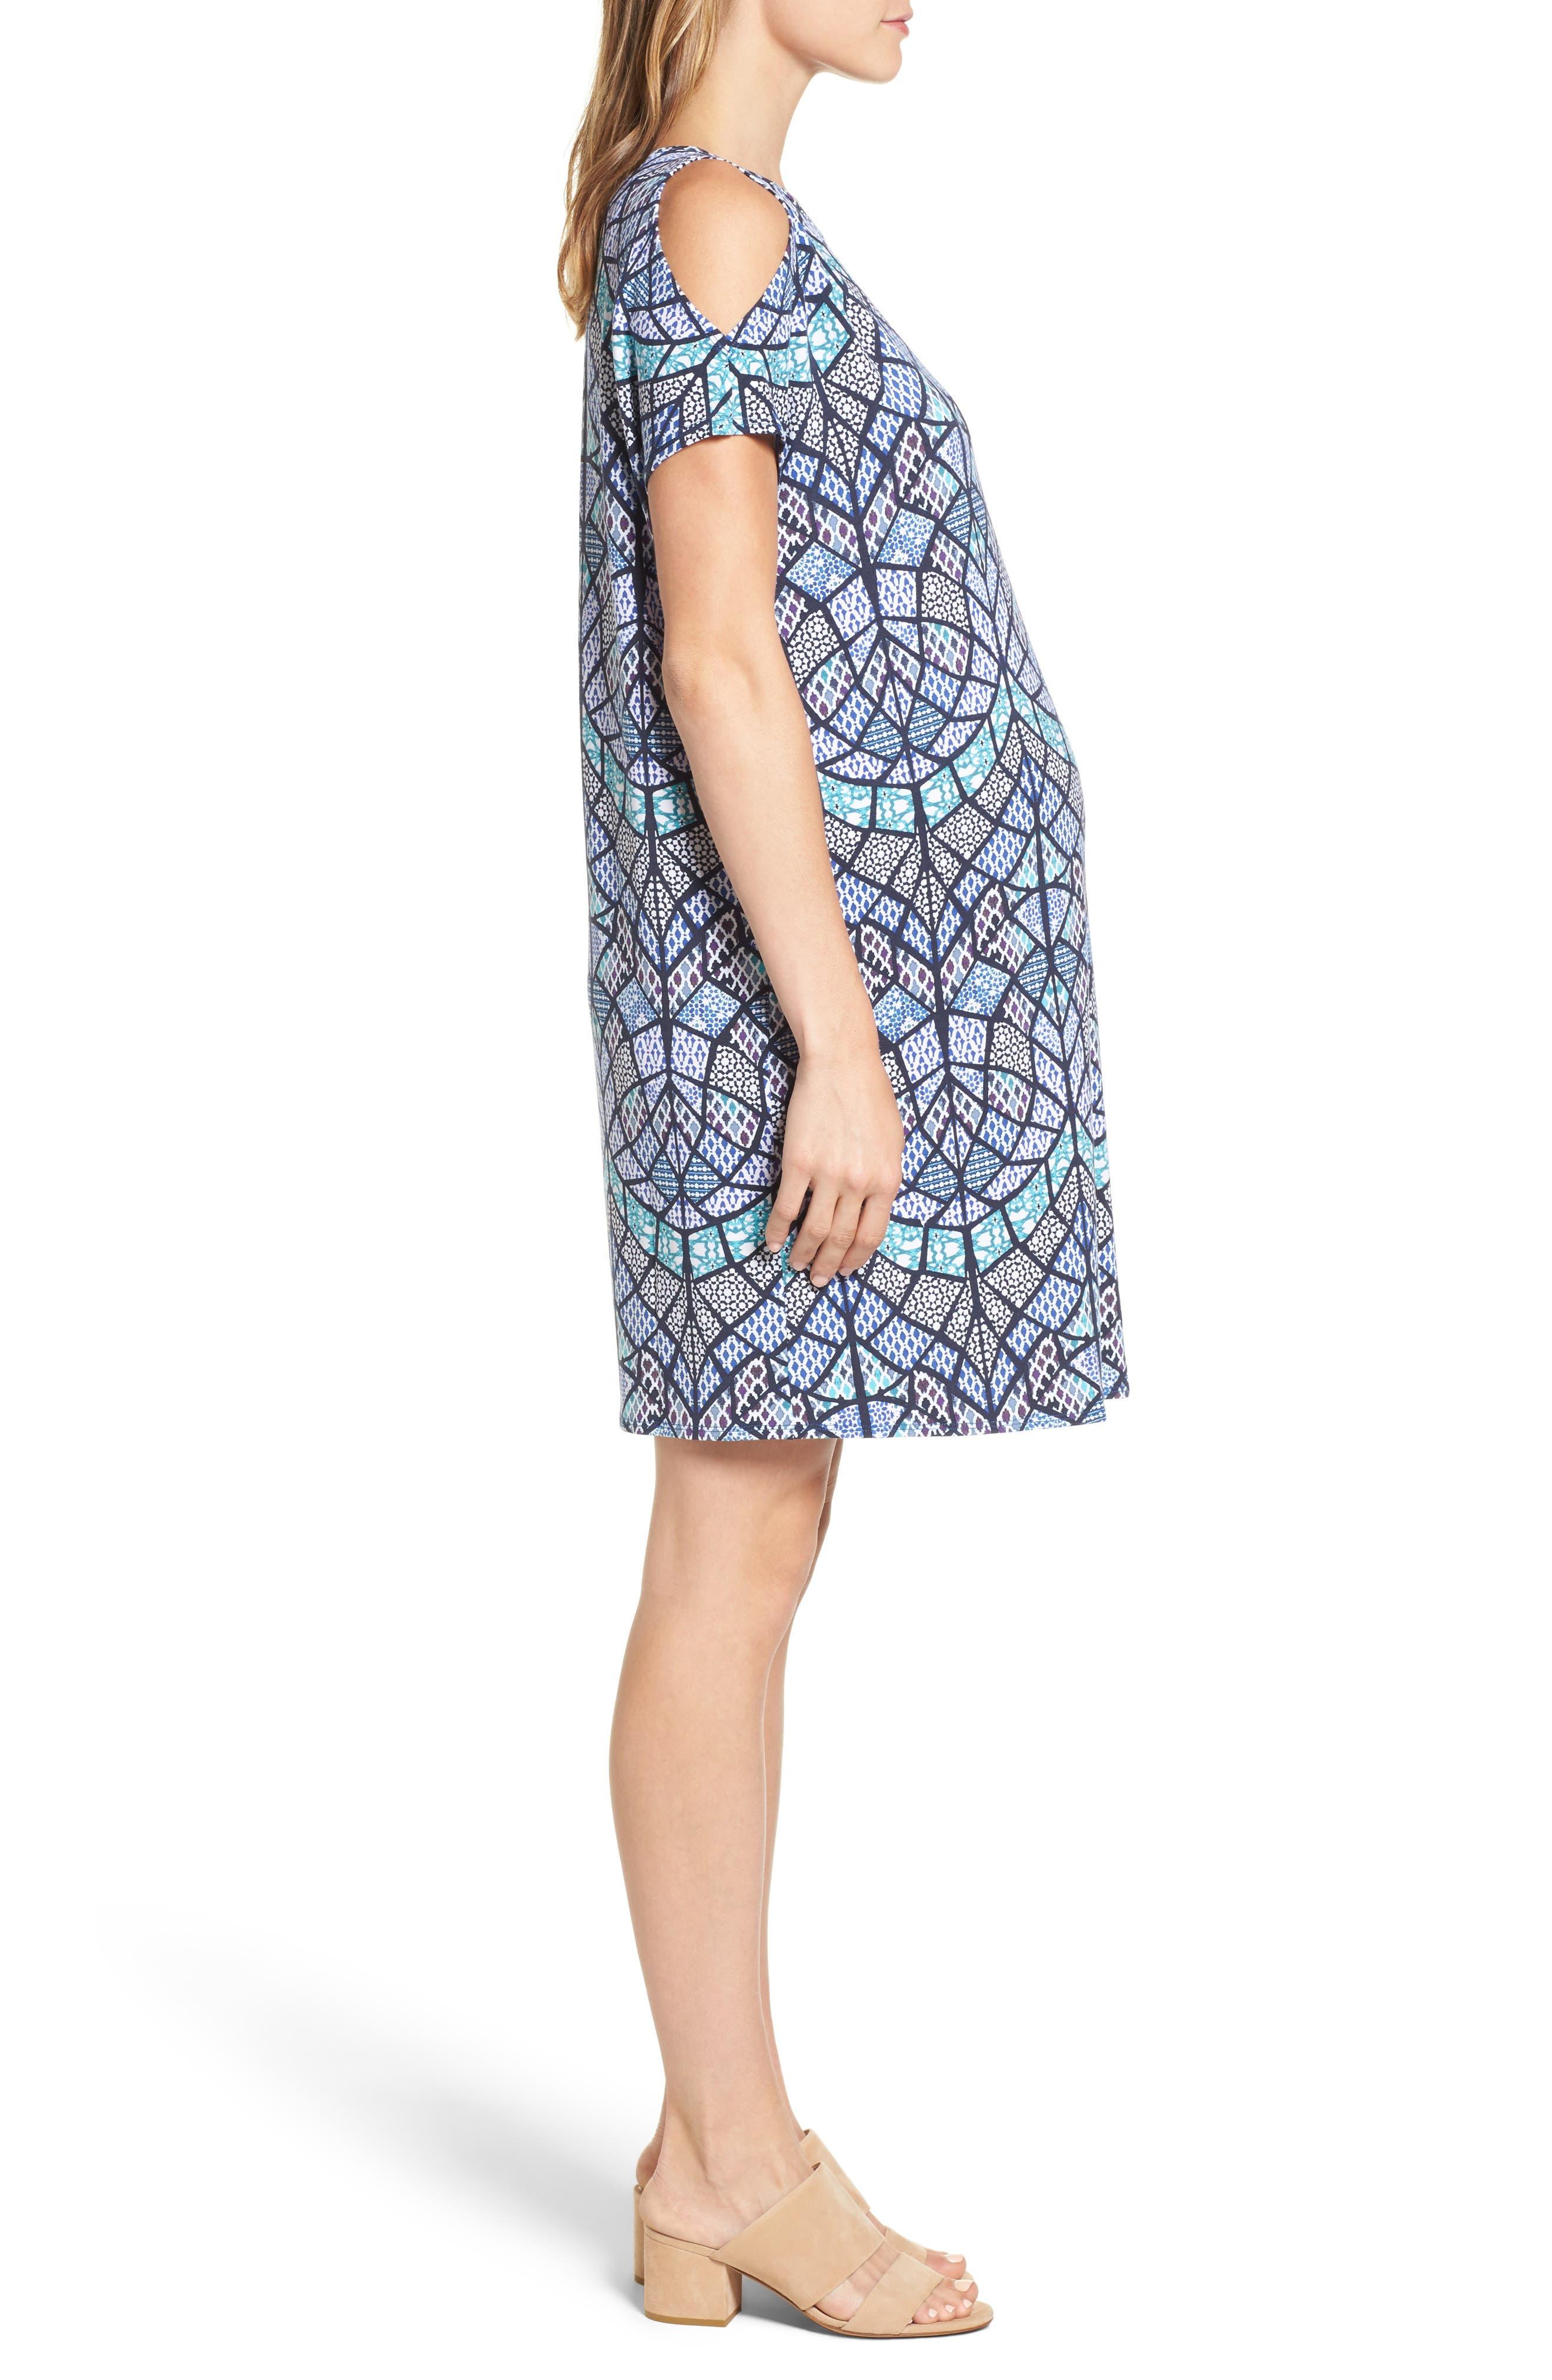 TART MATERNITY, Caia Cold Shoulder Maternity Dress, Alternate thumbnail 3, color, TILE MOSAIC